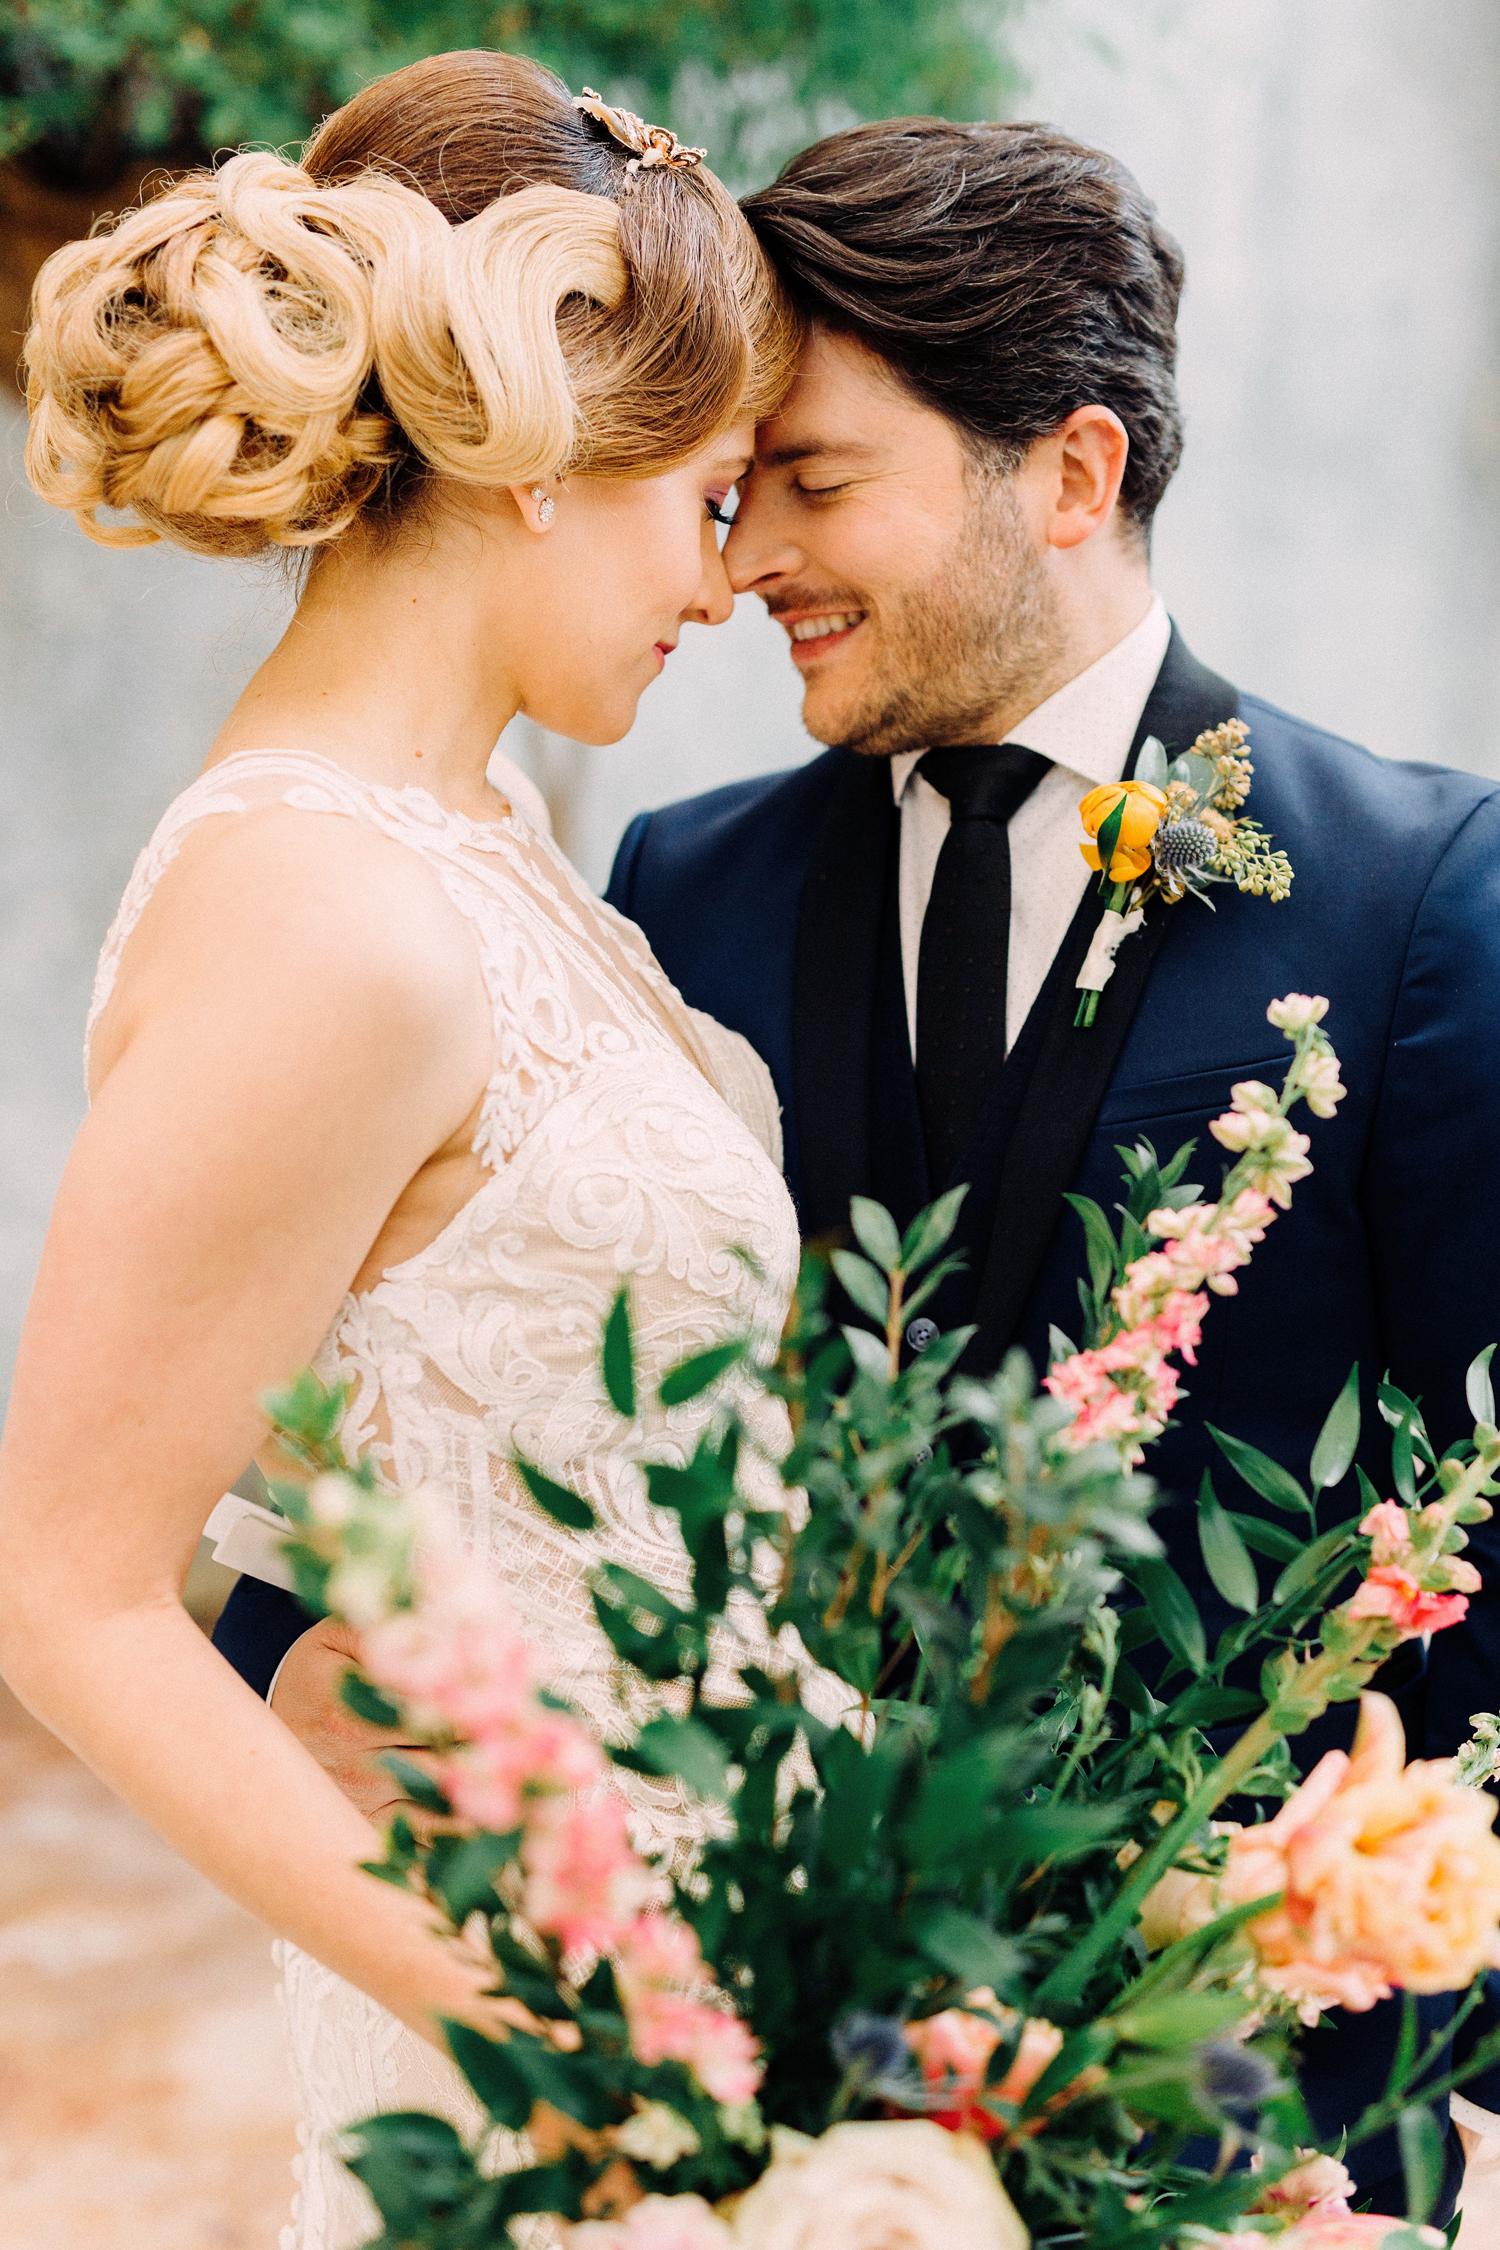 043-alaamarzouk-alaamarzoukphotography-mcallenweddingphotographer-alaa-marzouk-mcallen-mission-wedding-texas-venue-photography-wedding-california-bride-bridal-engagement-austin-elopement.jpg